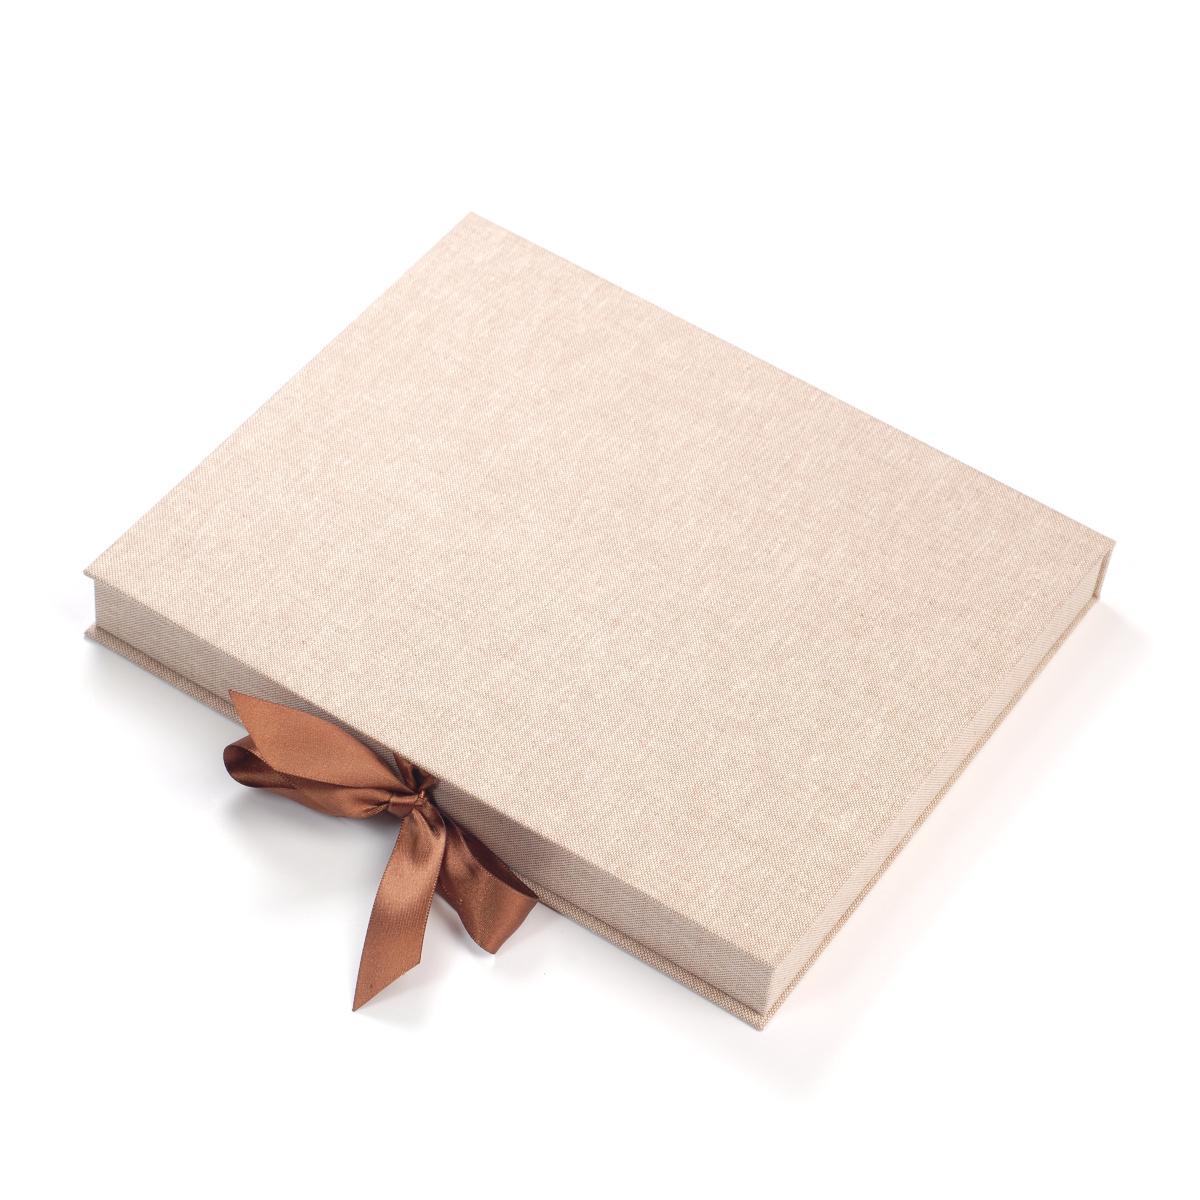 Dárková krabice na fotoknihu, album, fotografie